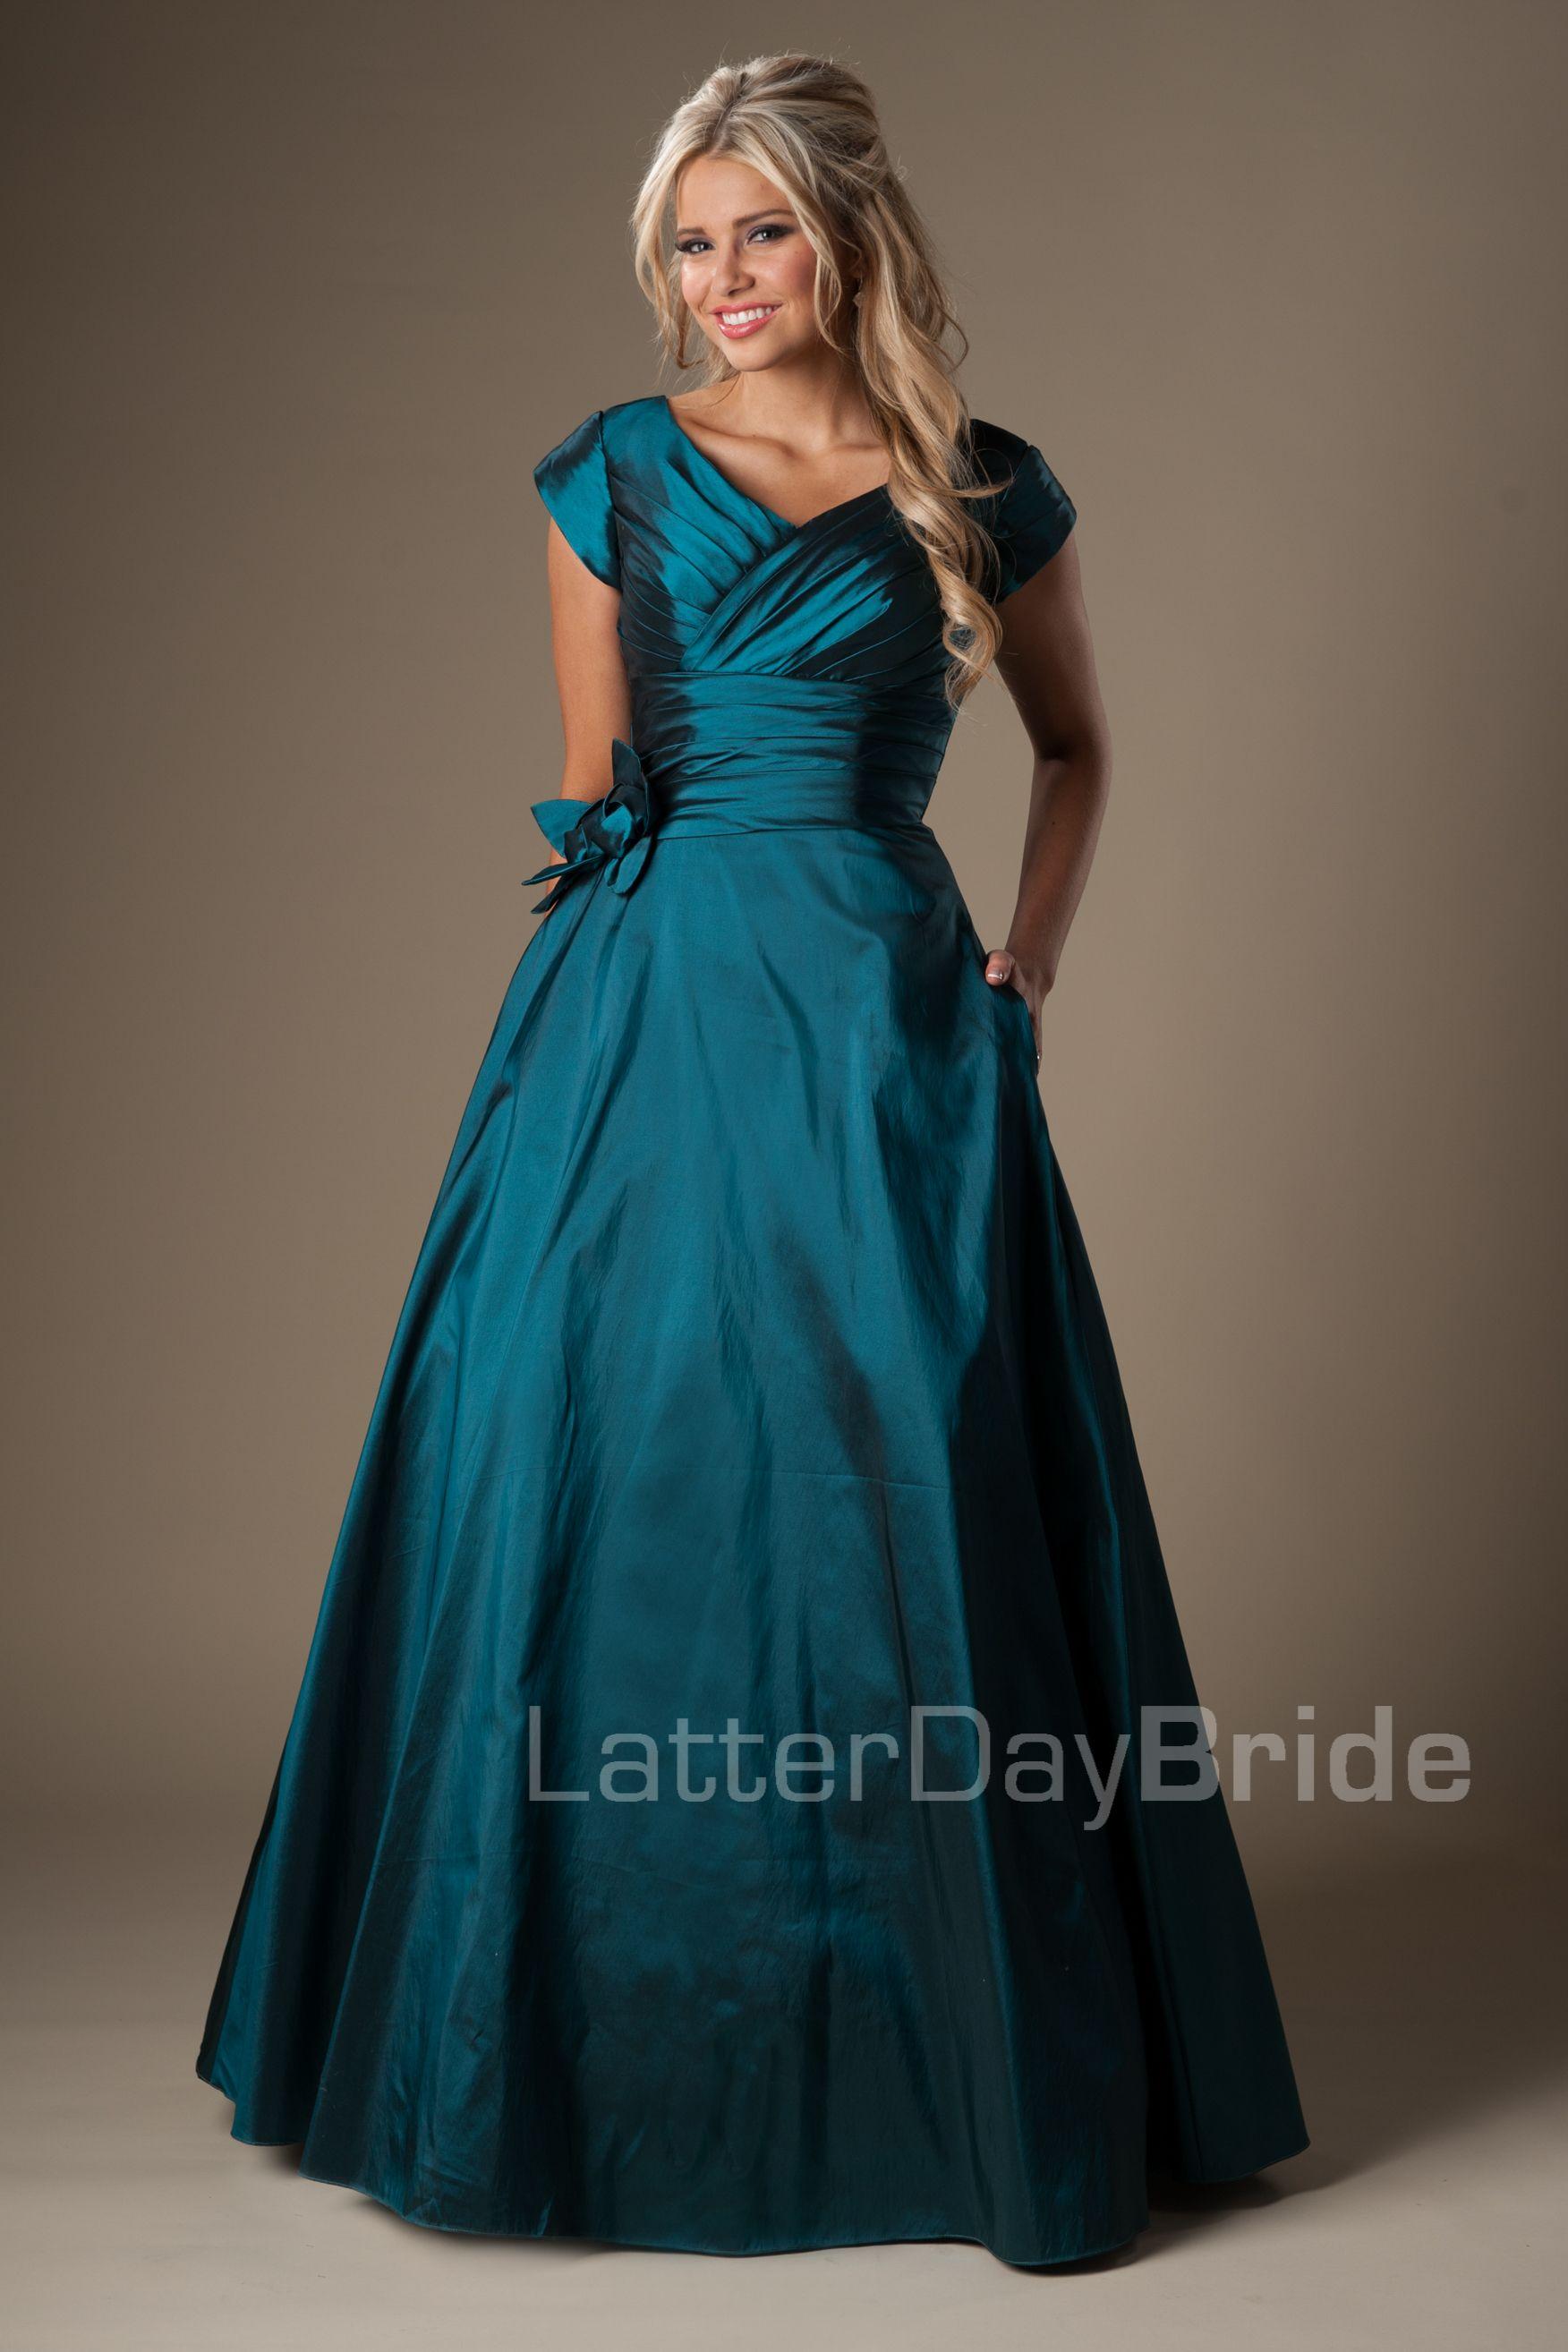 Modest Prom Dresses : Nalani | Formal occasions | Pinterest ...